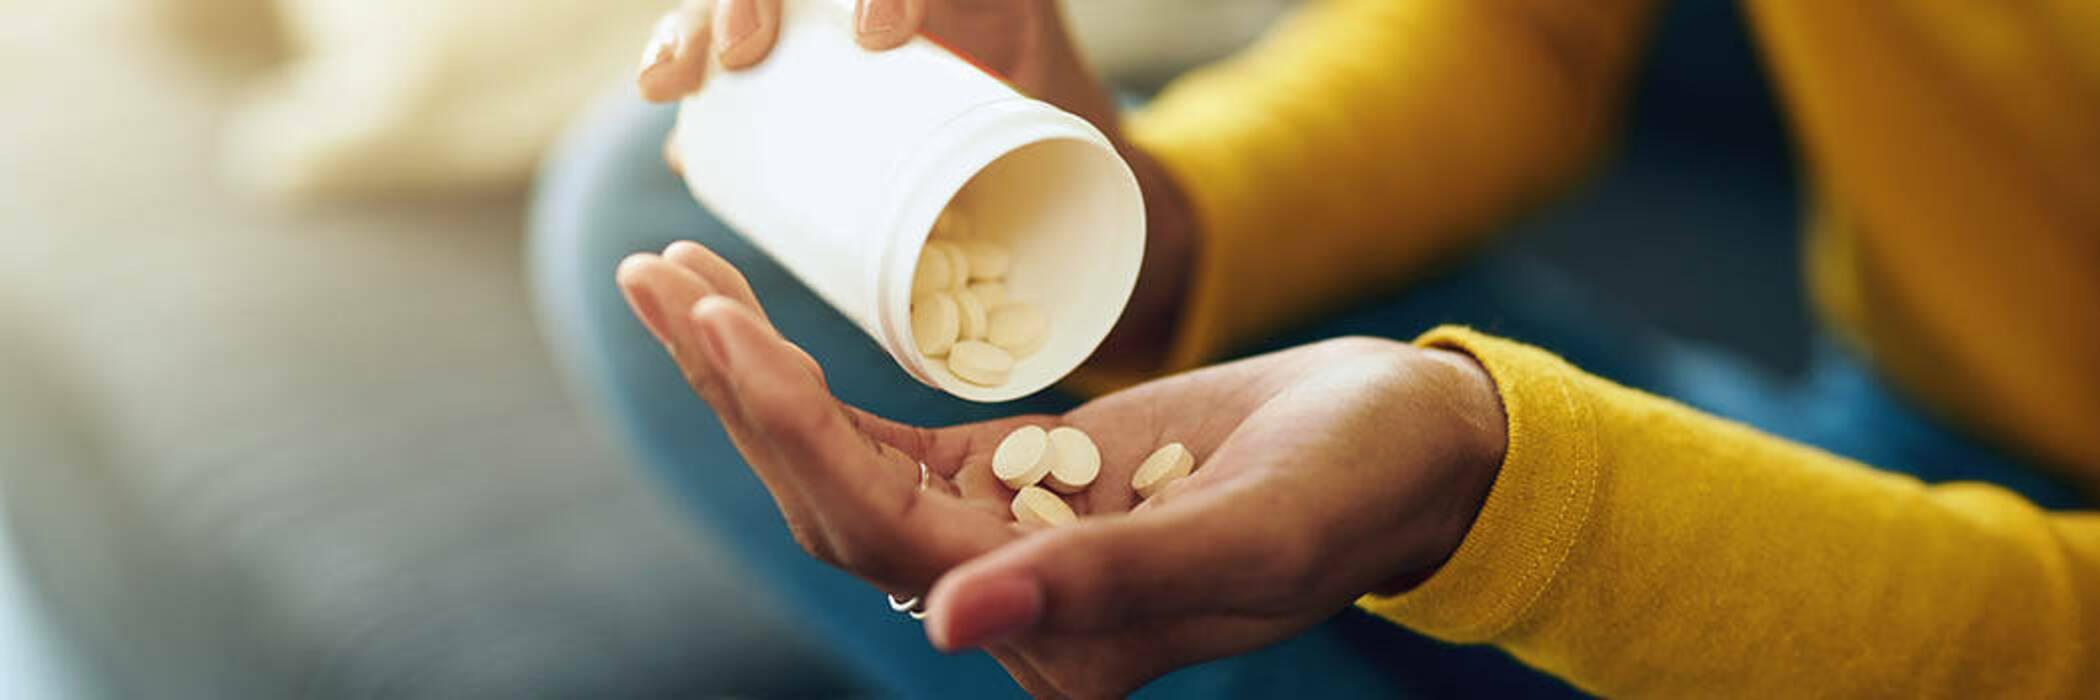 20sep arthrem supplements hero